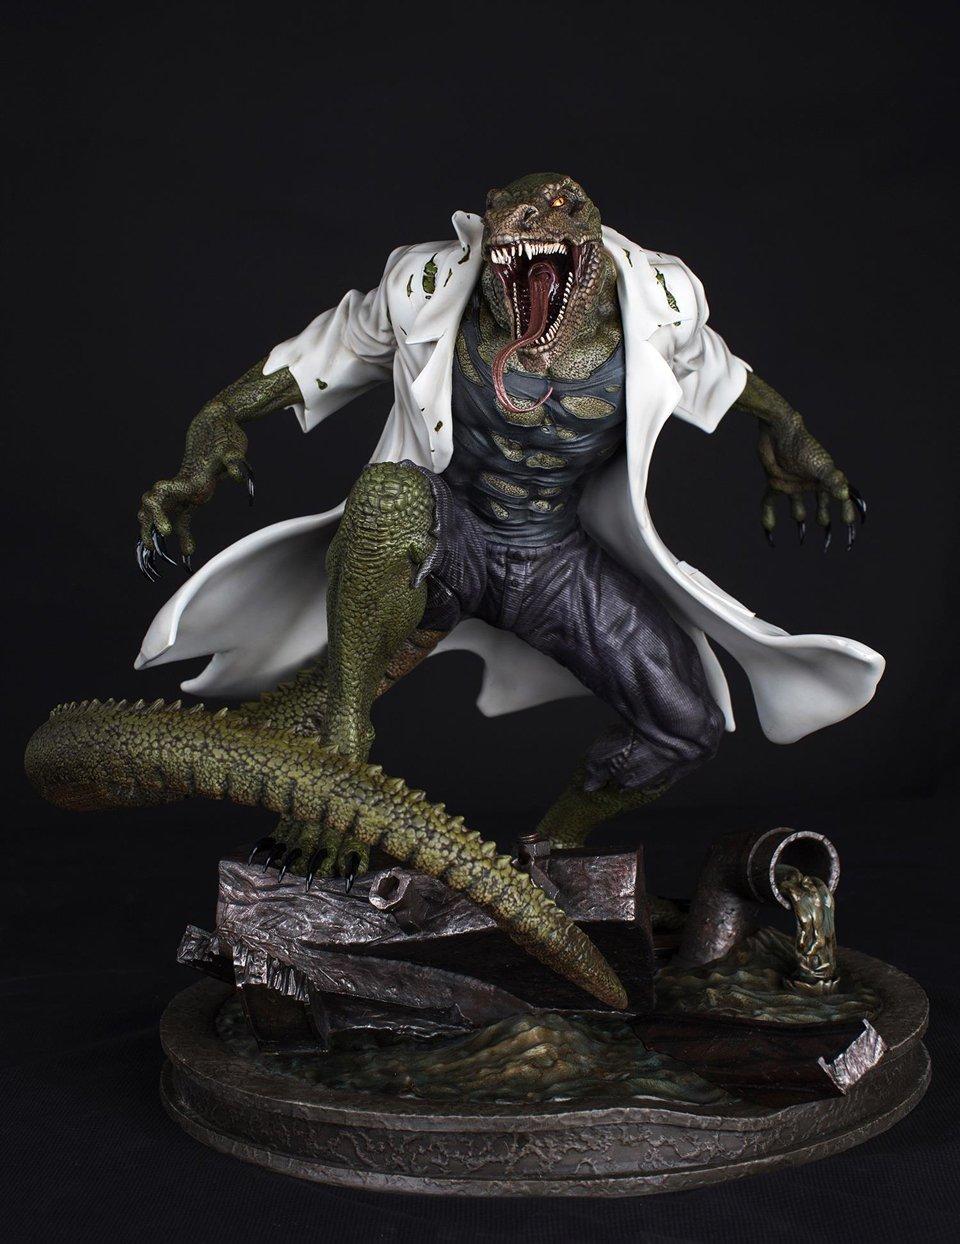 XM Studios Lizard & Vulture 1/4 Scale Statues